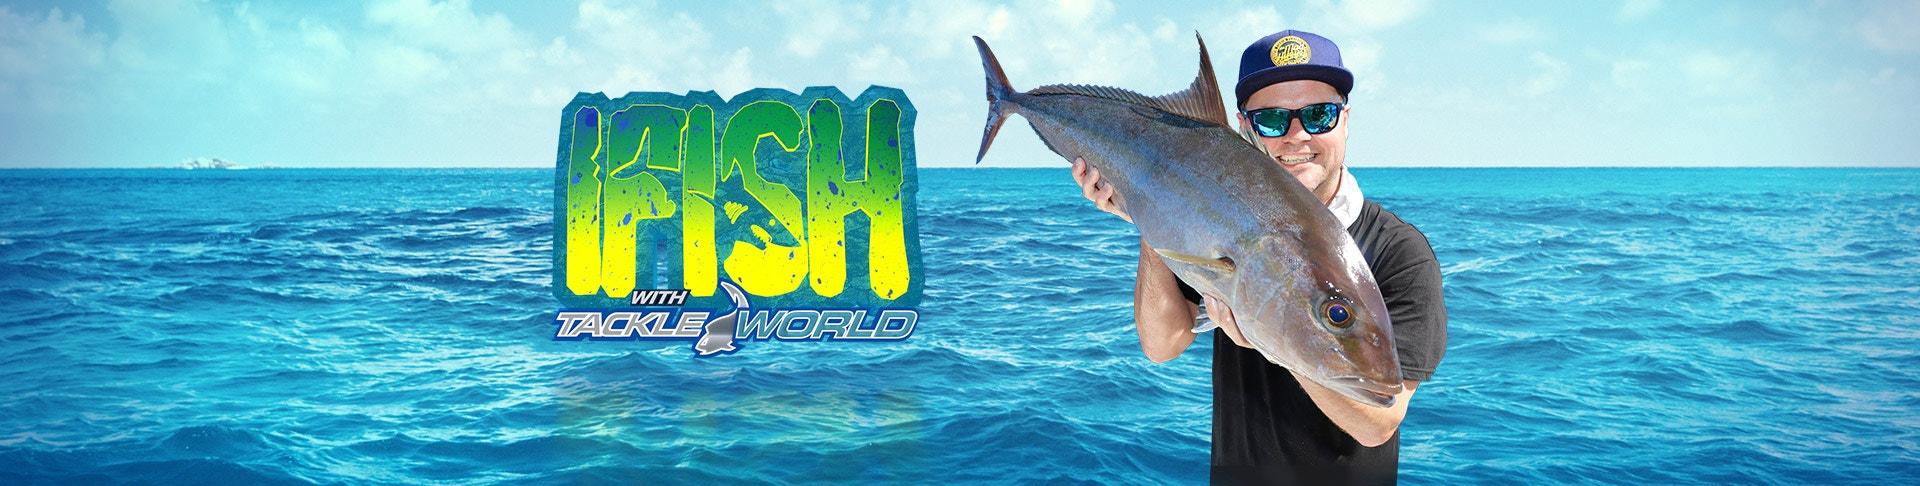 iFish - Network Ten